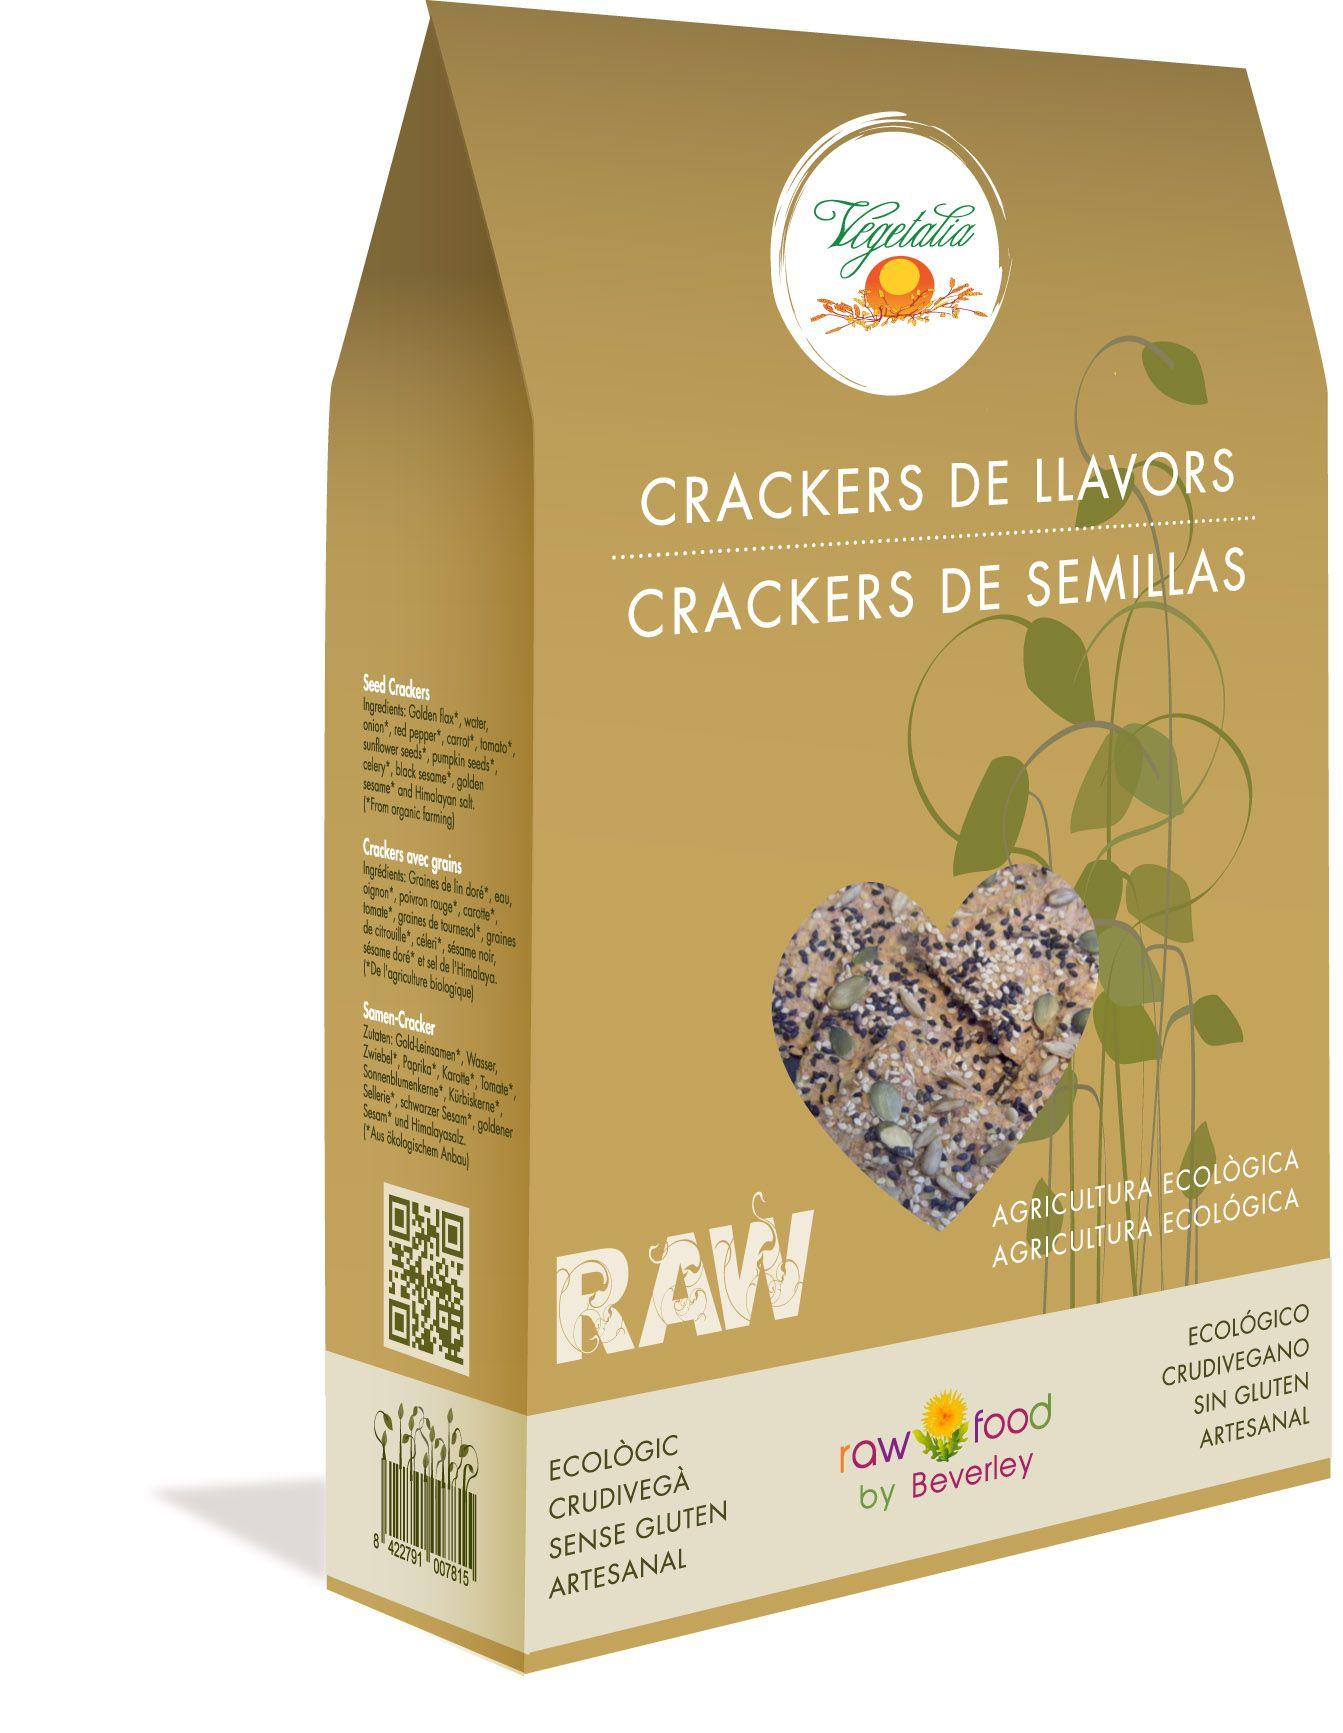 Crackers de Semillas - Raw Food www.rawfooddietforlife.com